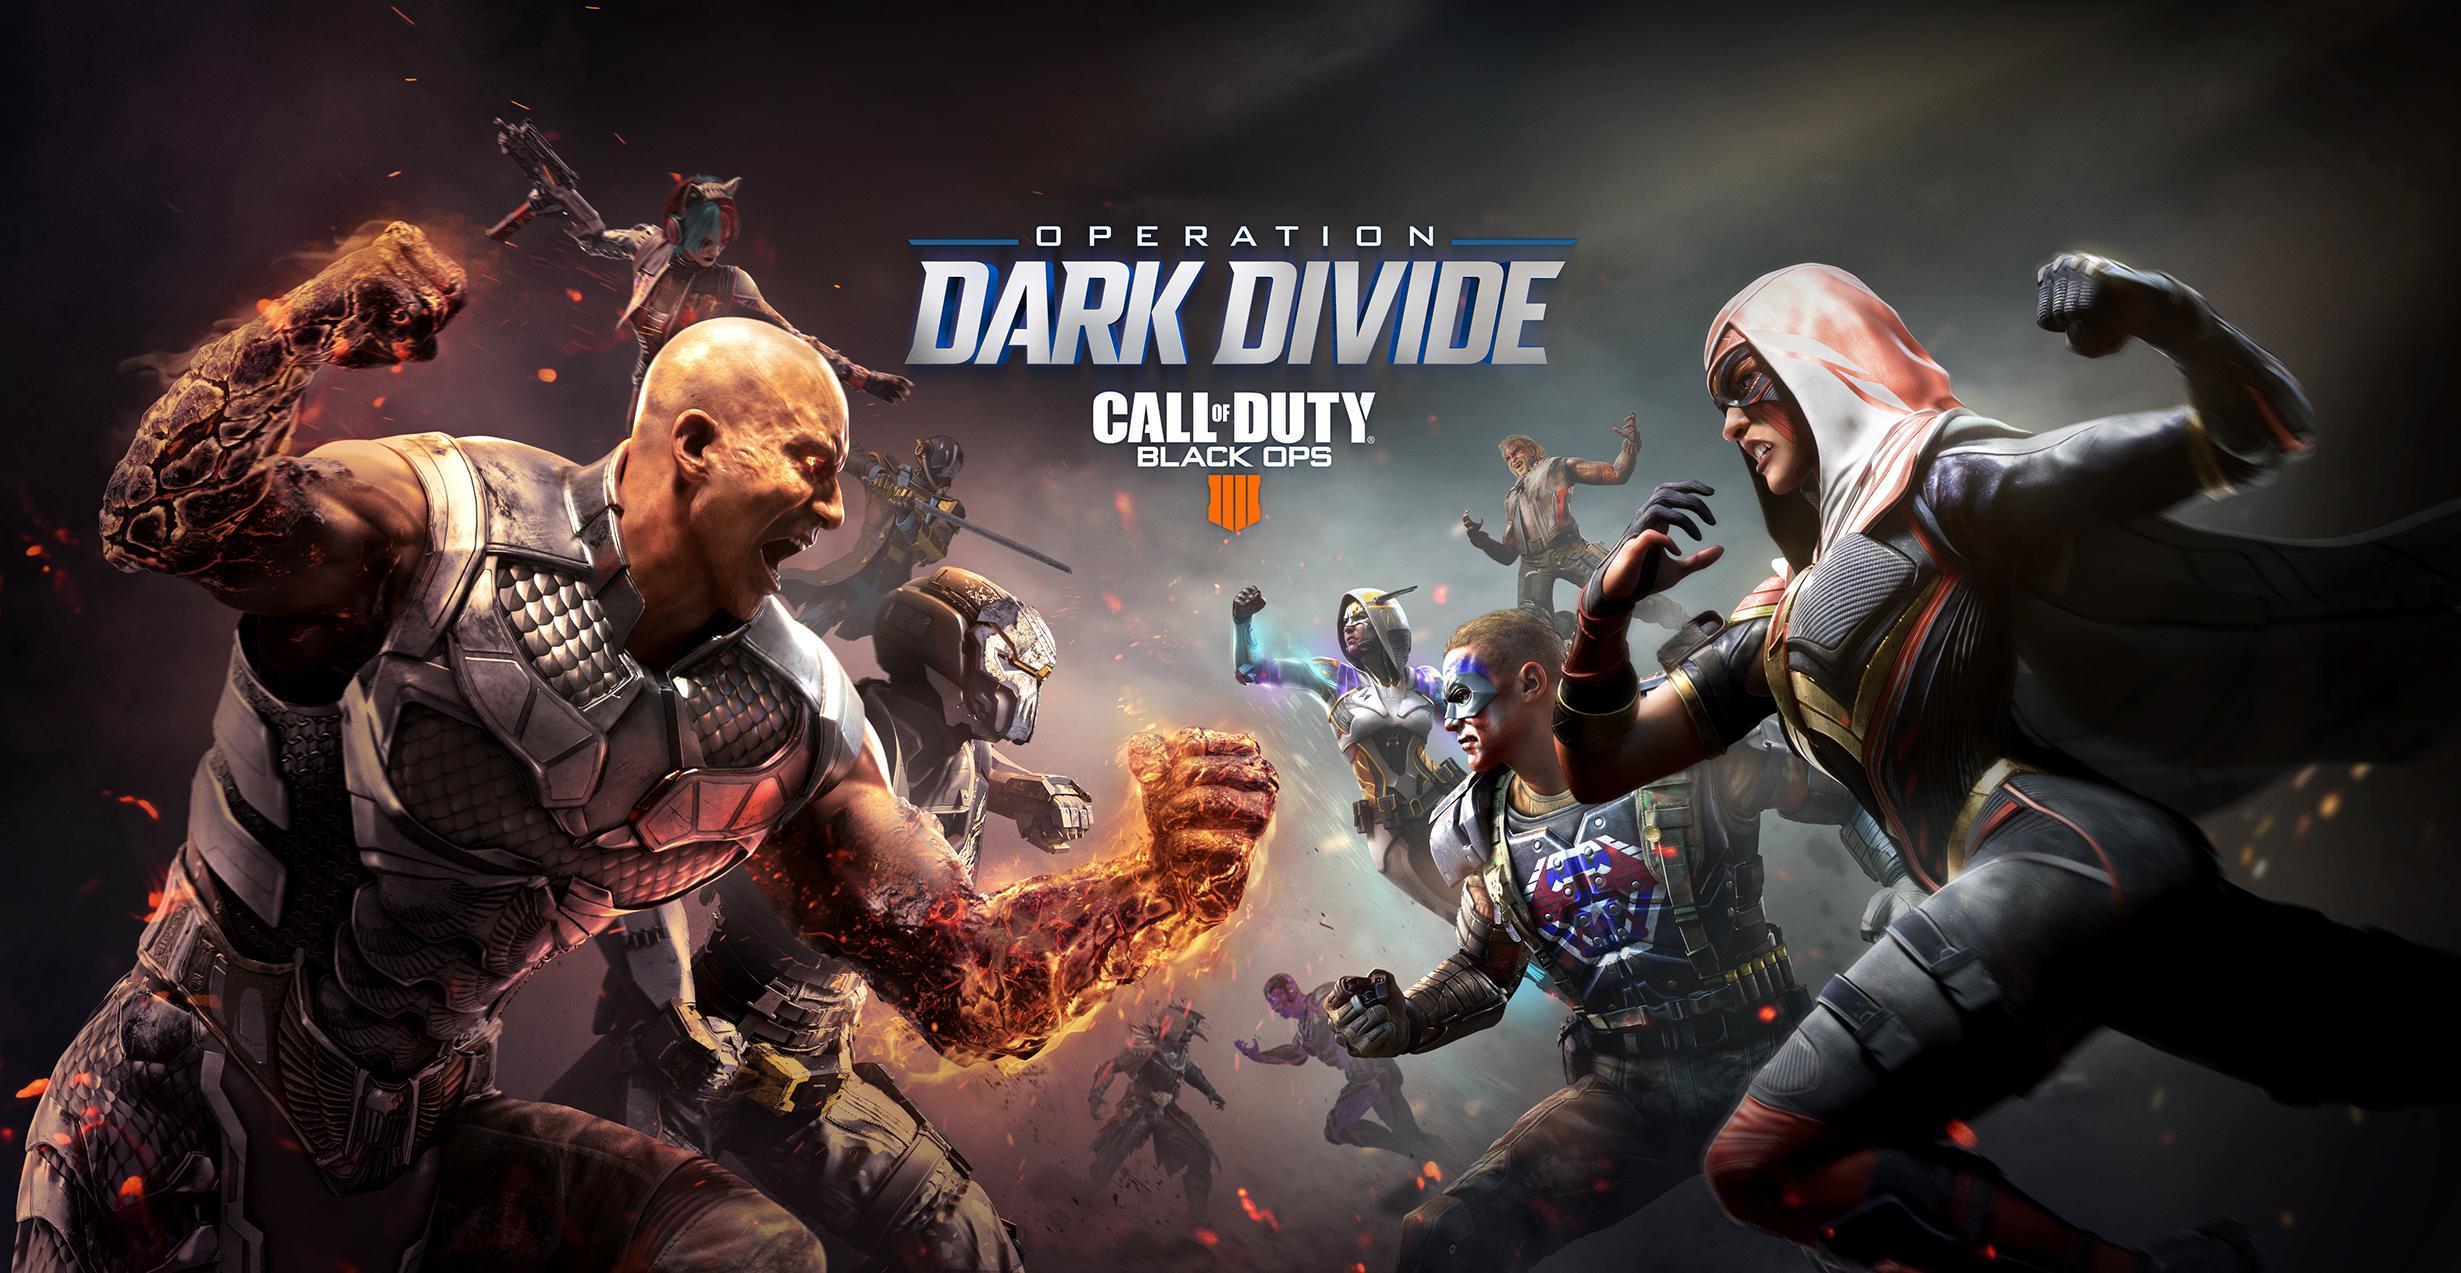 Operation Dark Divide Call Of Duty Wiki Fandom